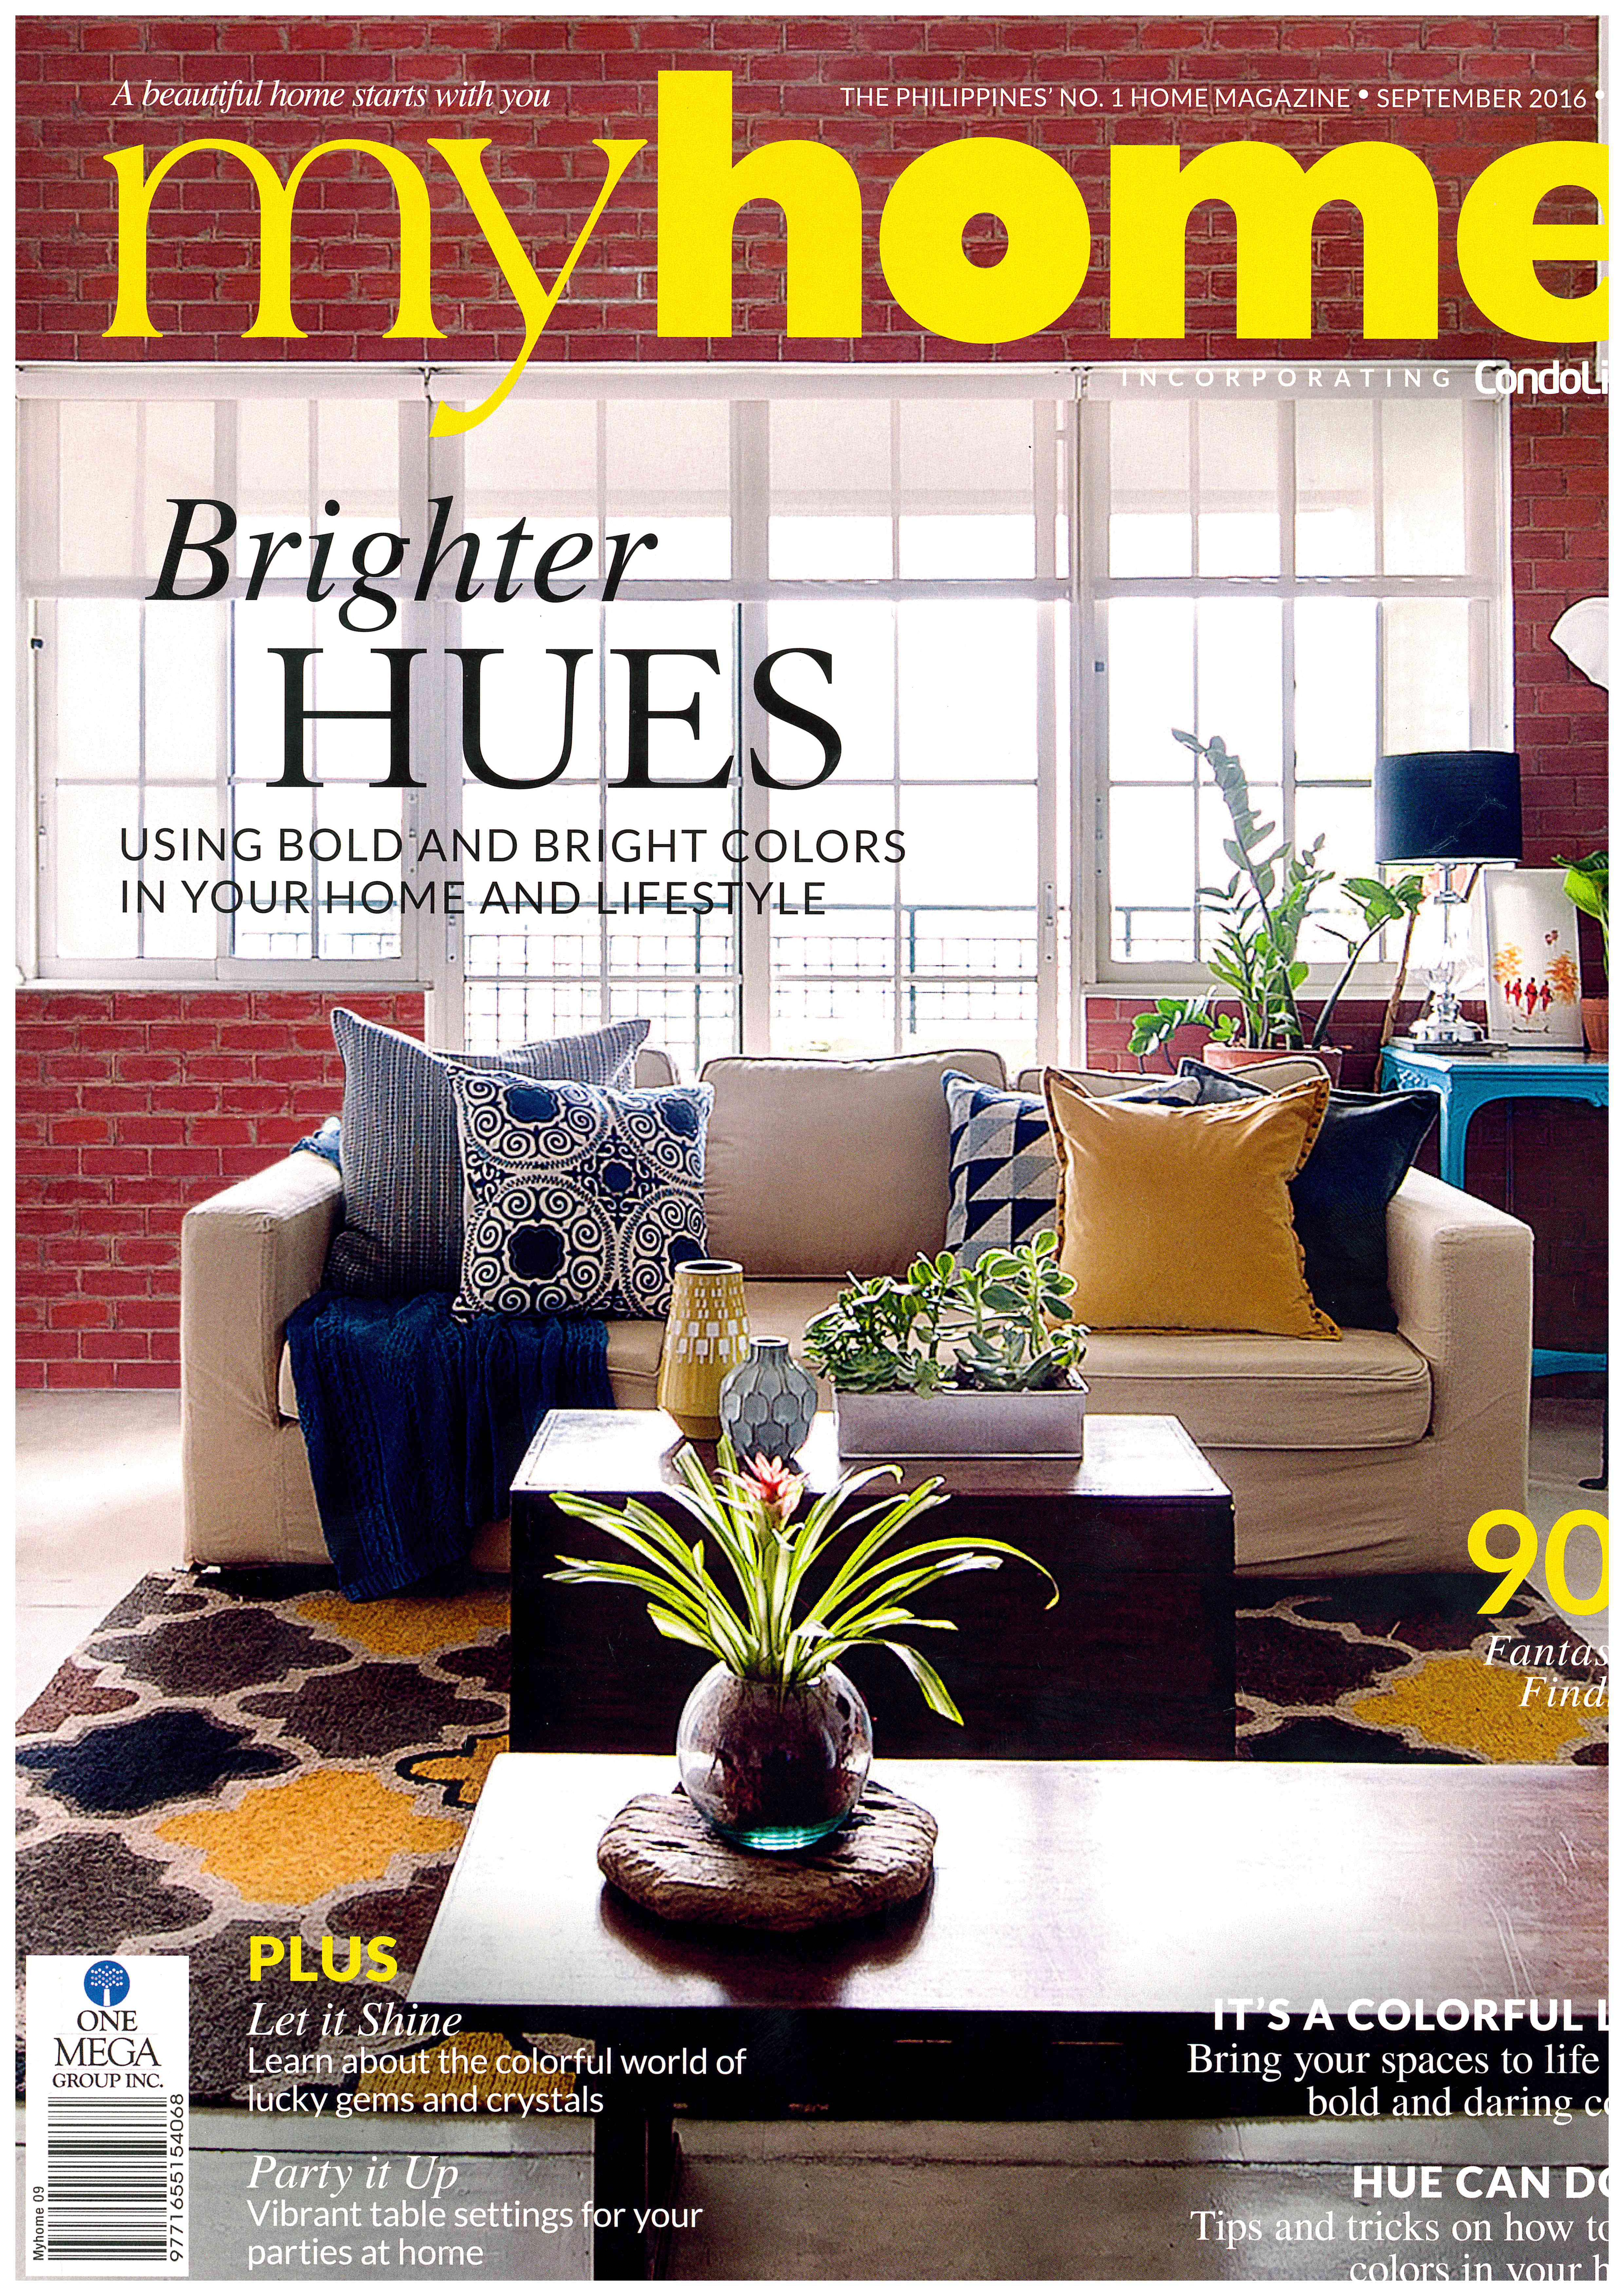 interior design | Adefuin Design Studio - Design Excellence in Every ...